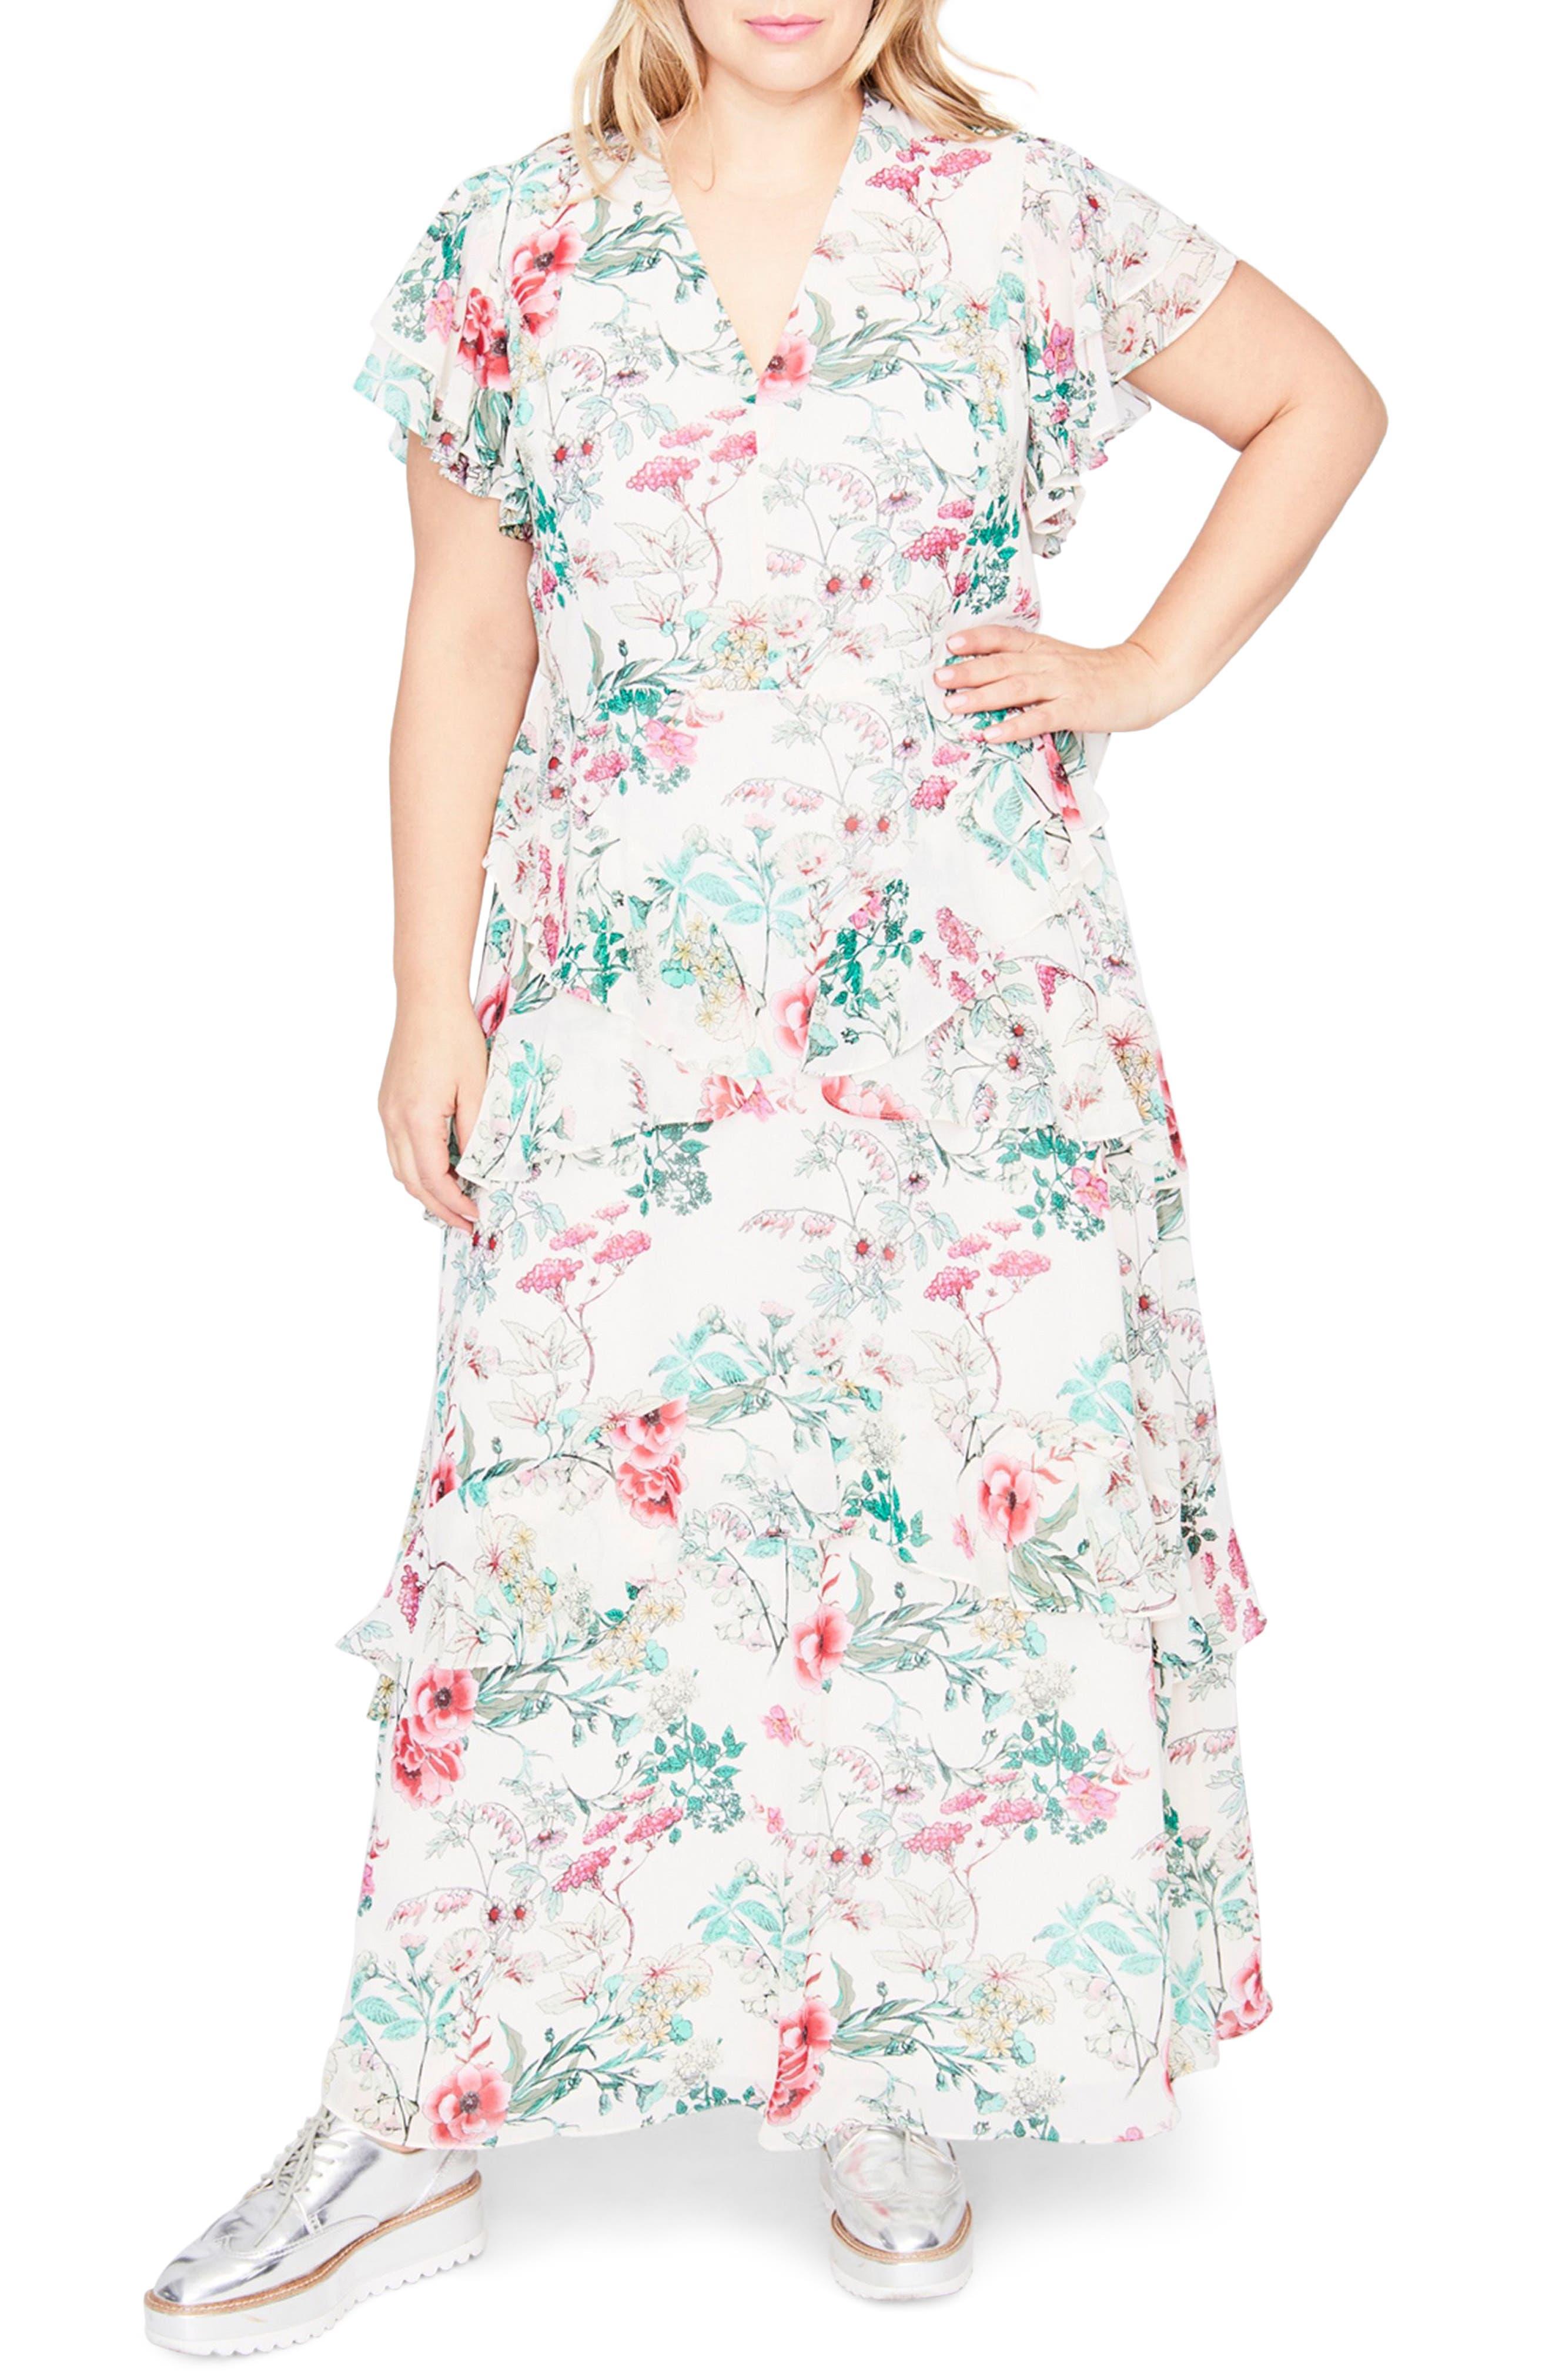 Ruffle Floral Maxi Dress,                             Main thumbnail 1, color,                             Almond Milk Combo